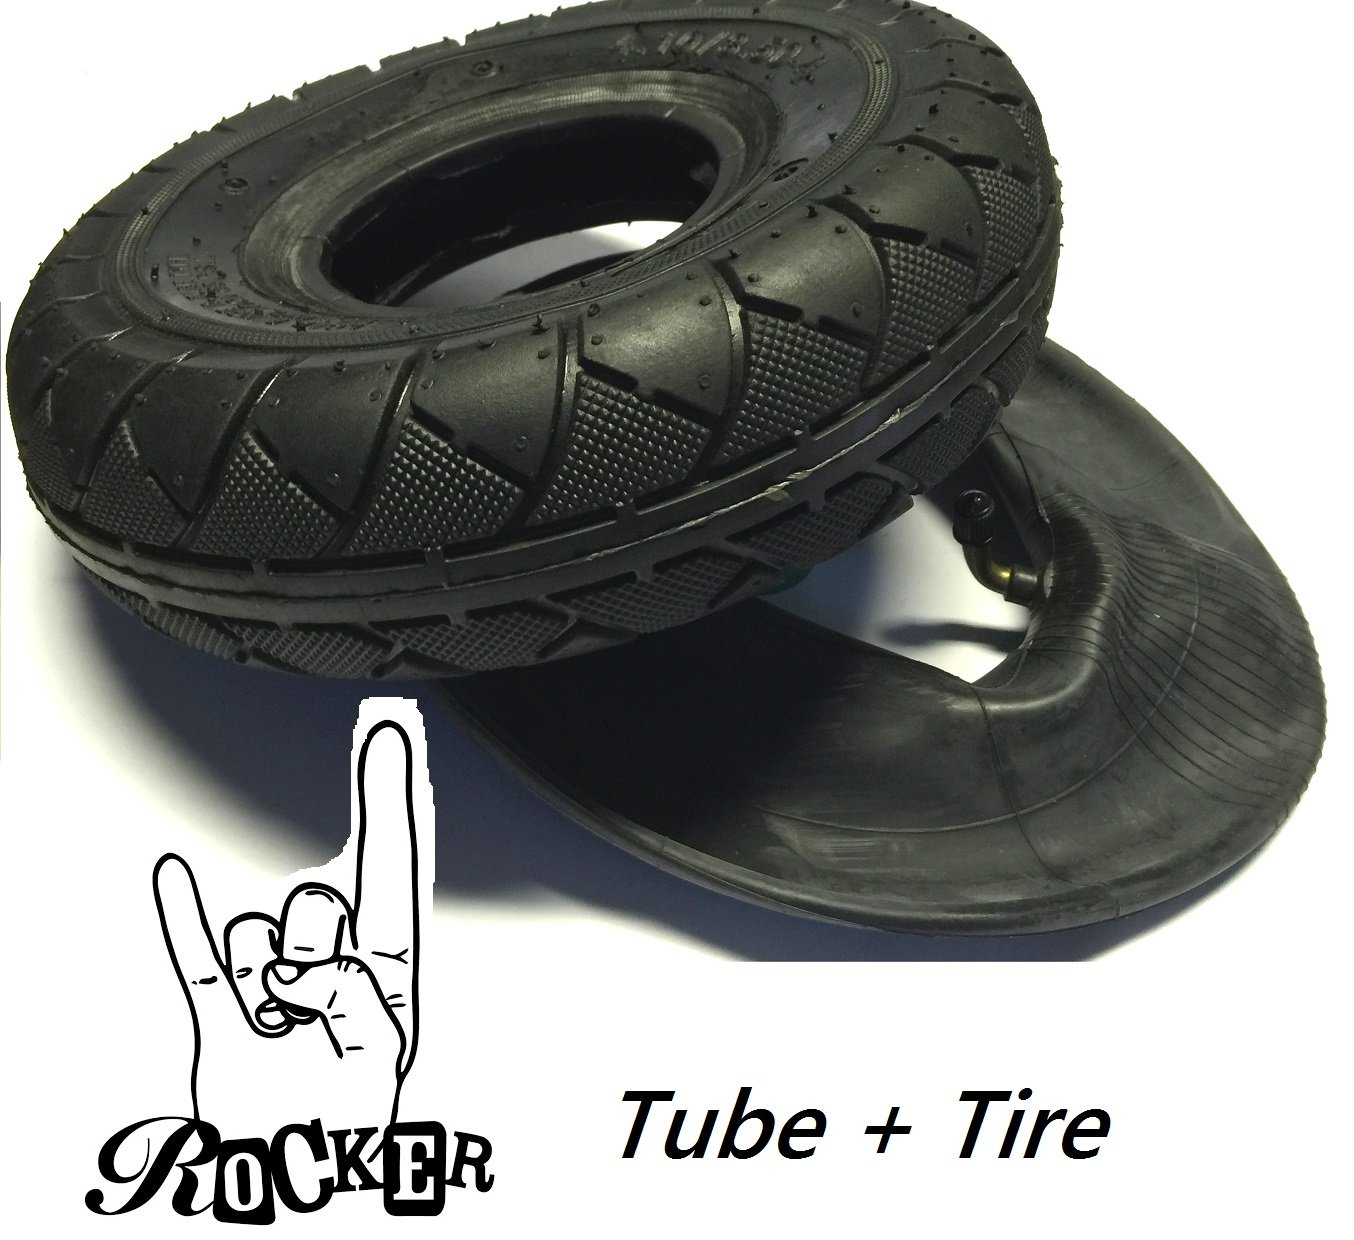 Rocker The Mini BMX repuesto Street V2 abrigo clásico neumáticos + manguera de repuesto con válvula de auto 792_tireV2+tube